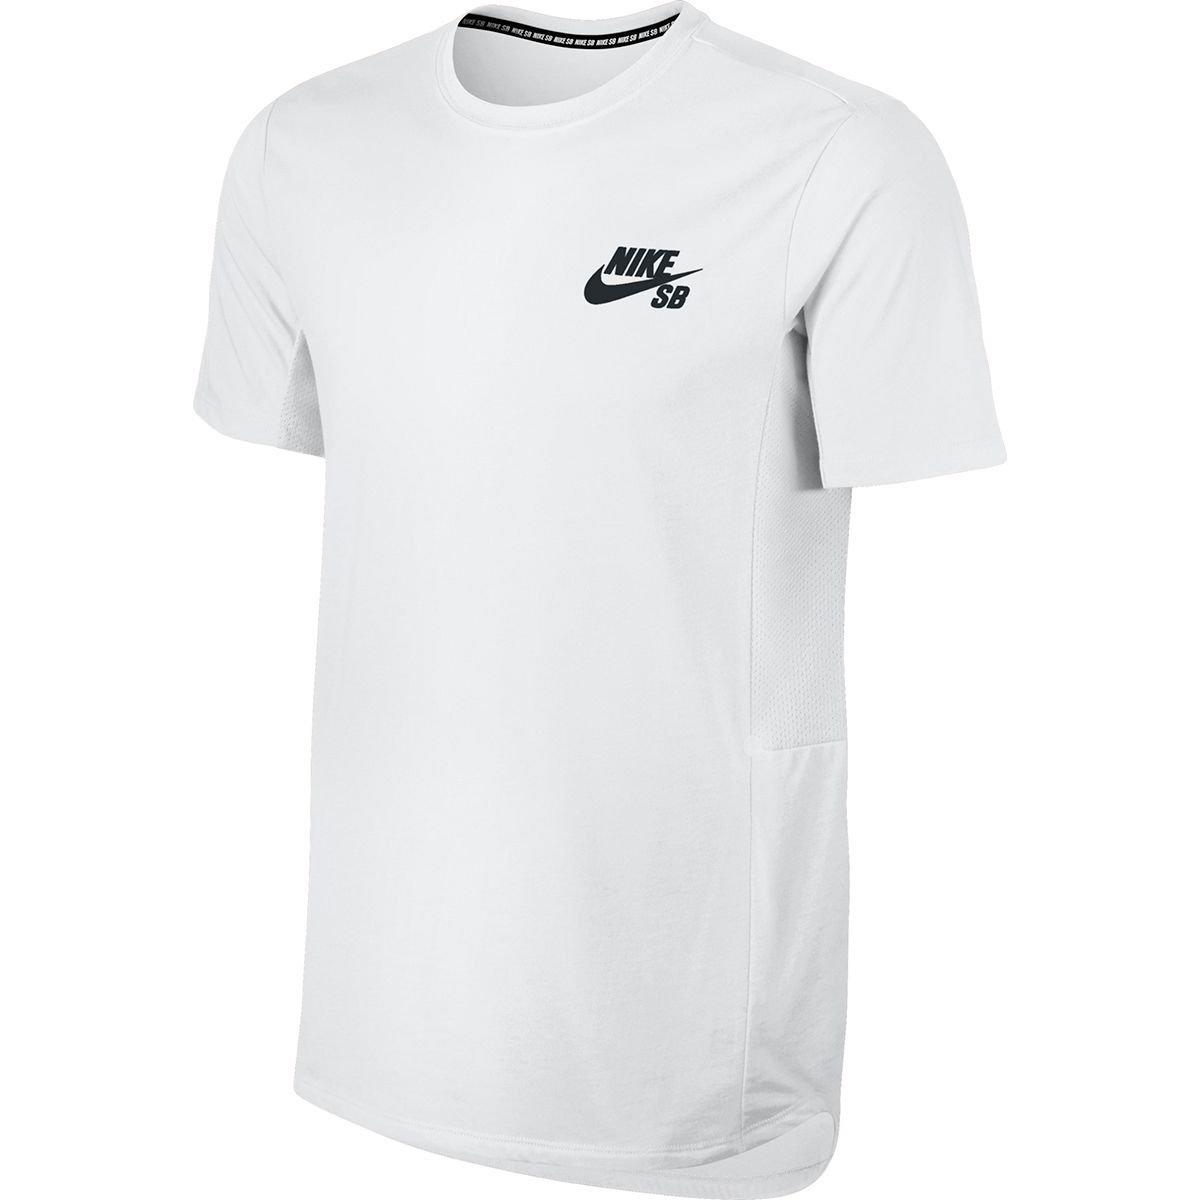 a5894a426 Amazon.com: Nike Mens SB Dry Skyline T-Shirt White/Black (Small): Sports &  Outdoors